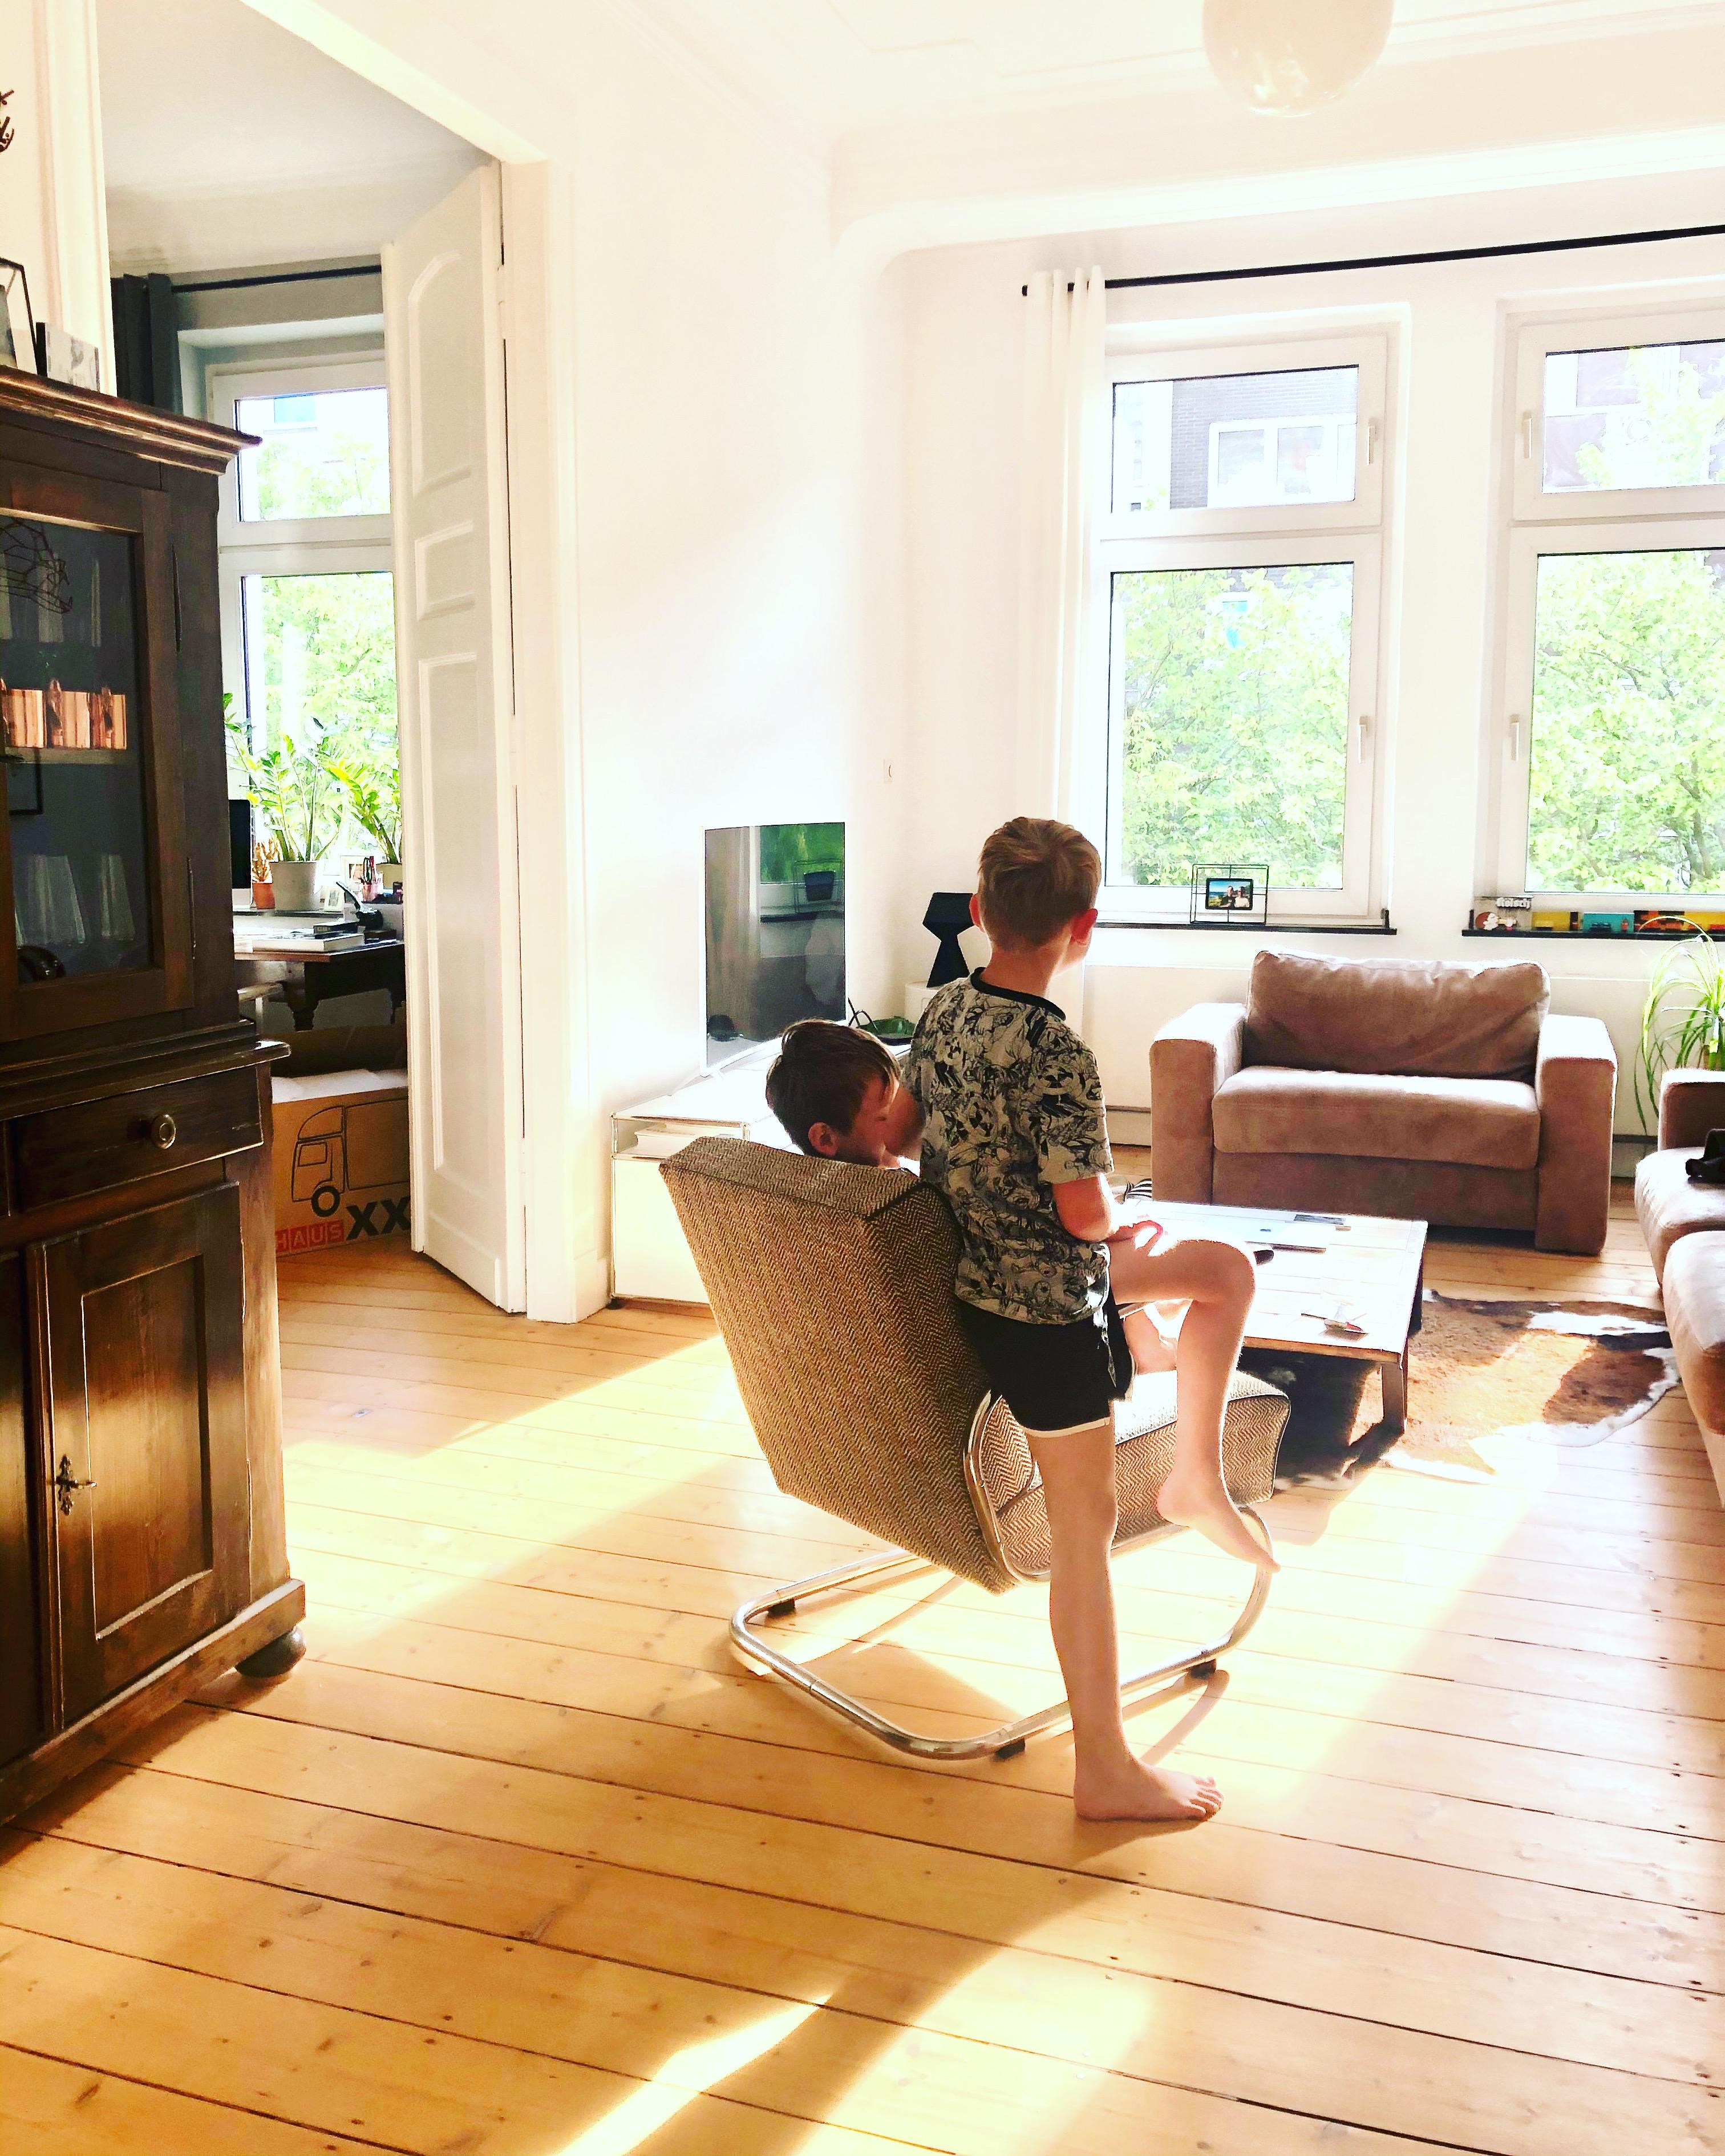 Jugendstil entdecken: Ideen zum Einrichtungsstil!